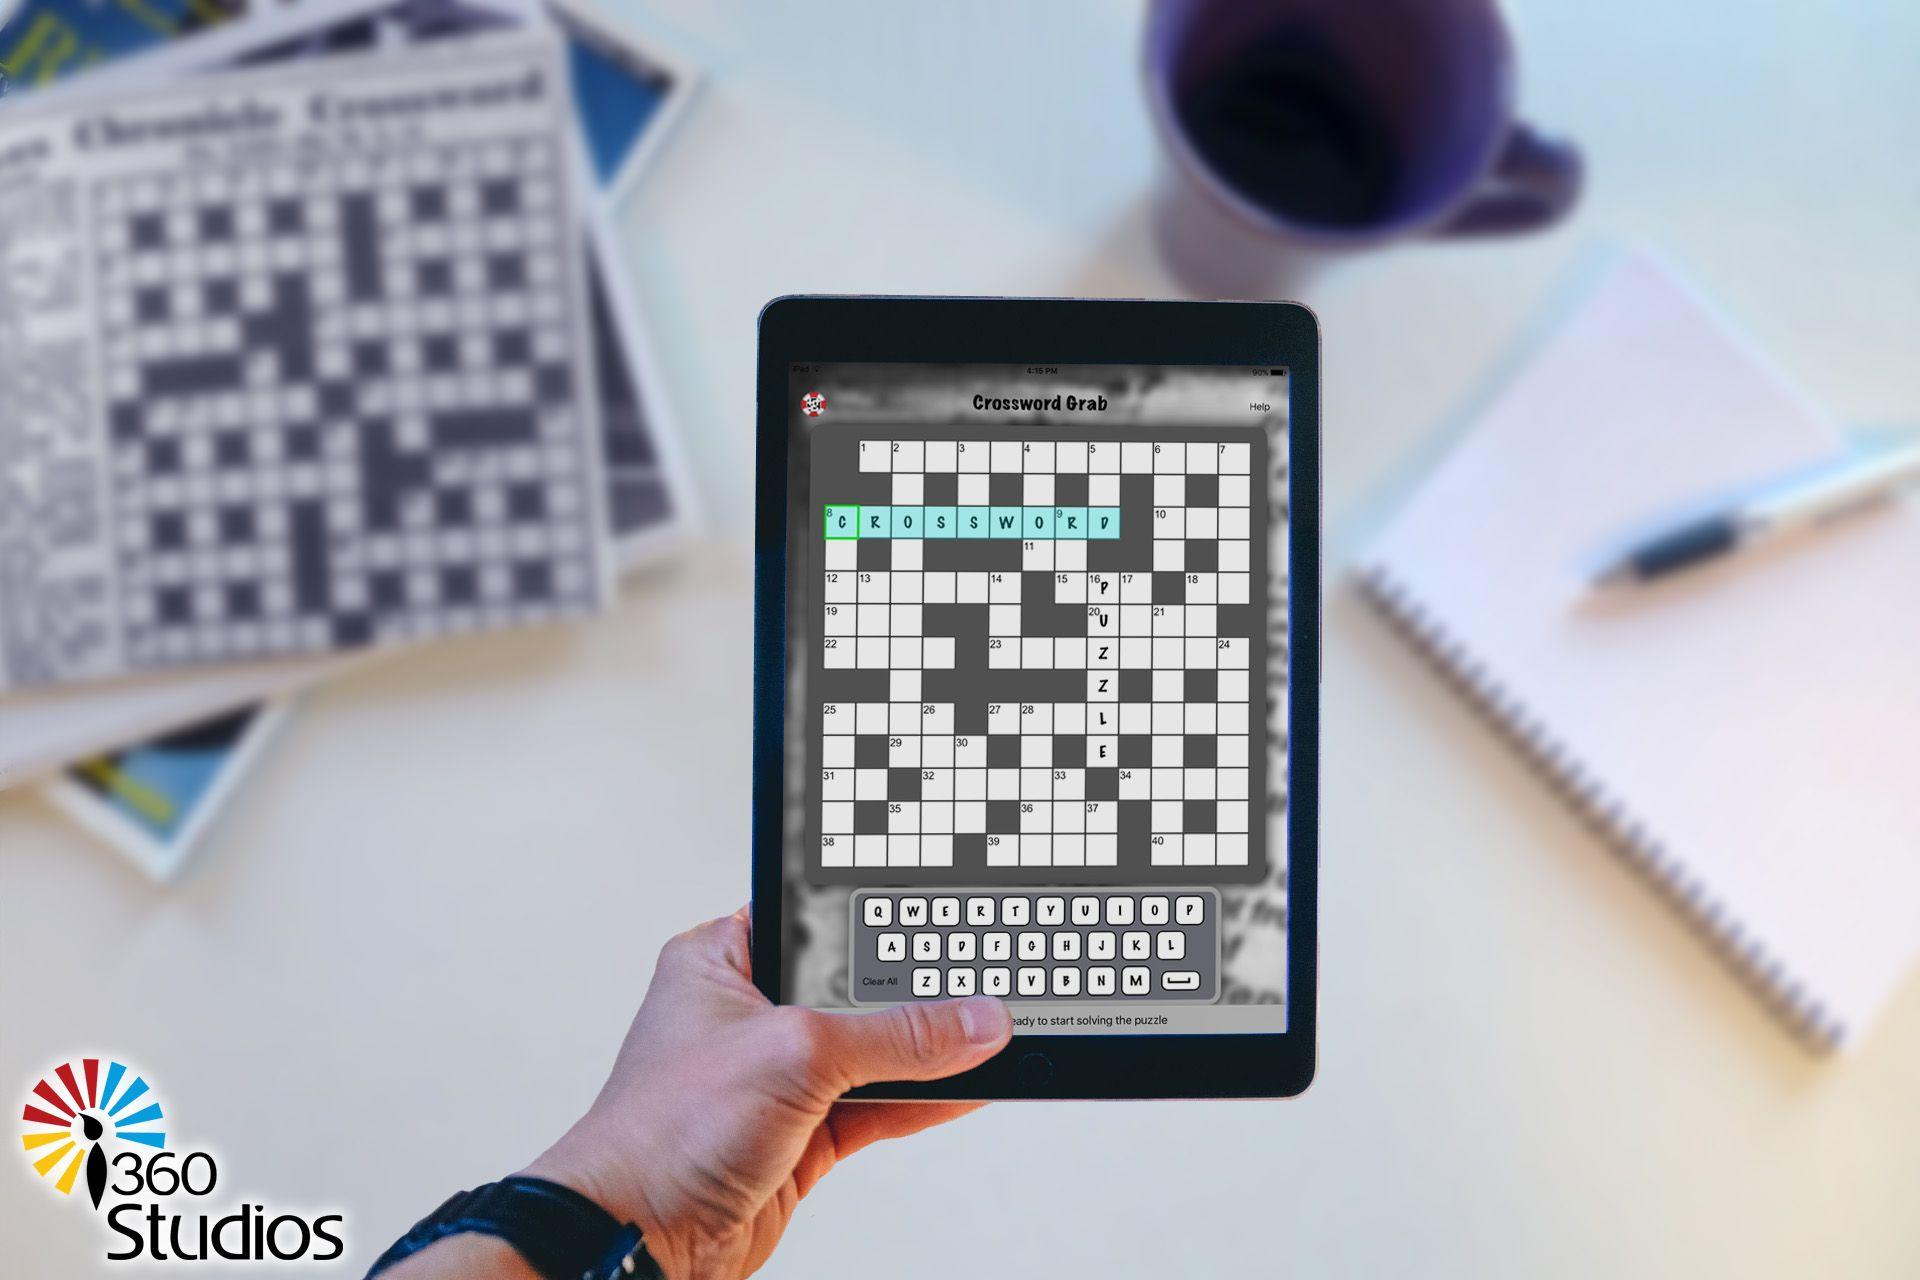 Crossword Grab in 2020 App, Airplane magazine, Crossword